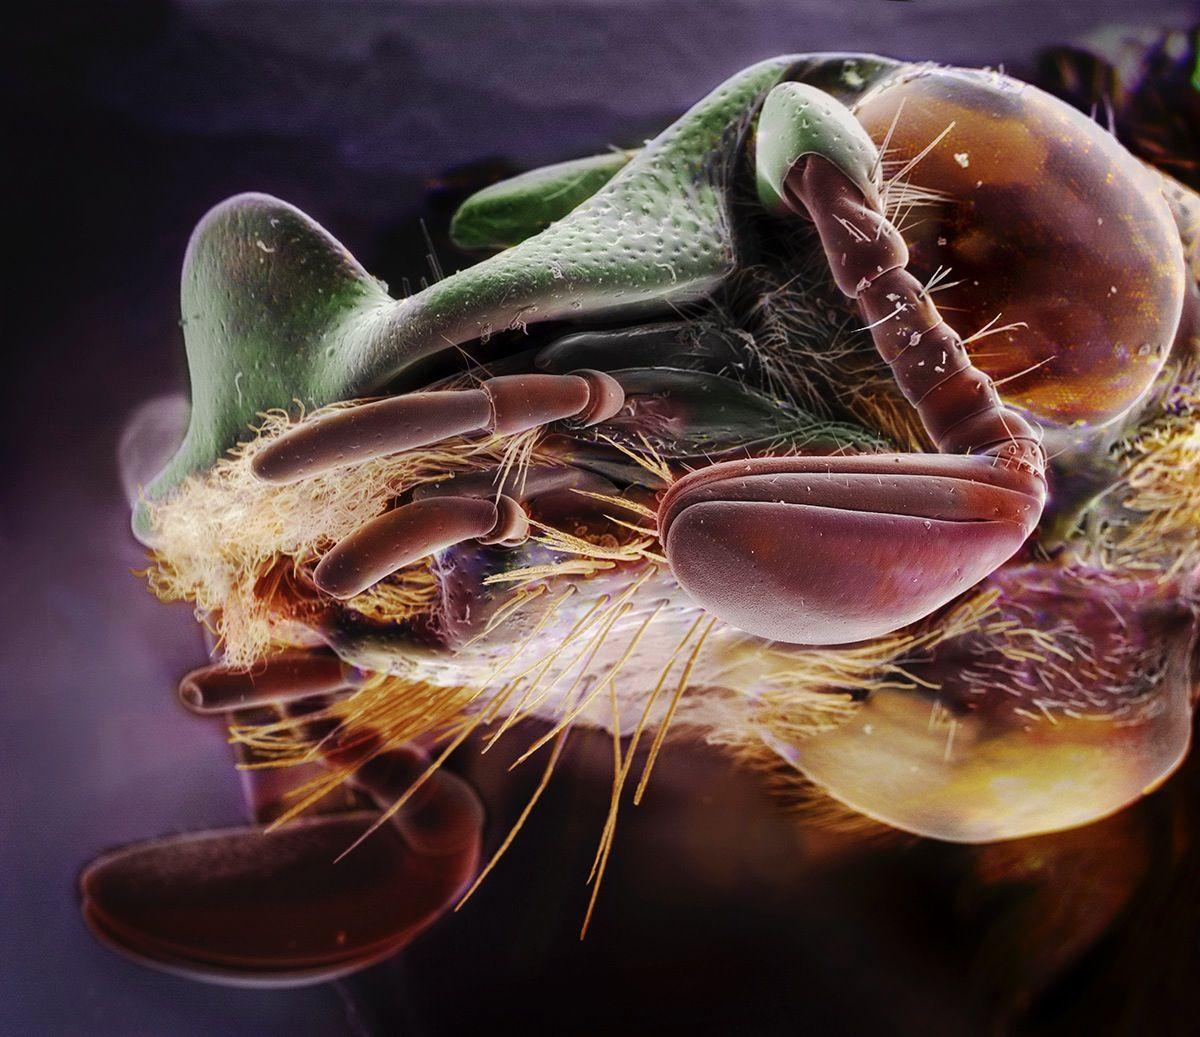 Suburban Symbiosis: Insectum Domesticus